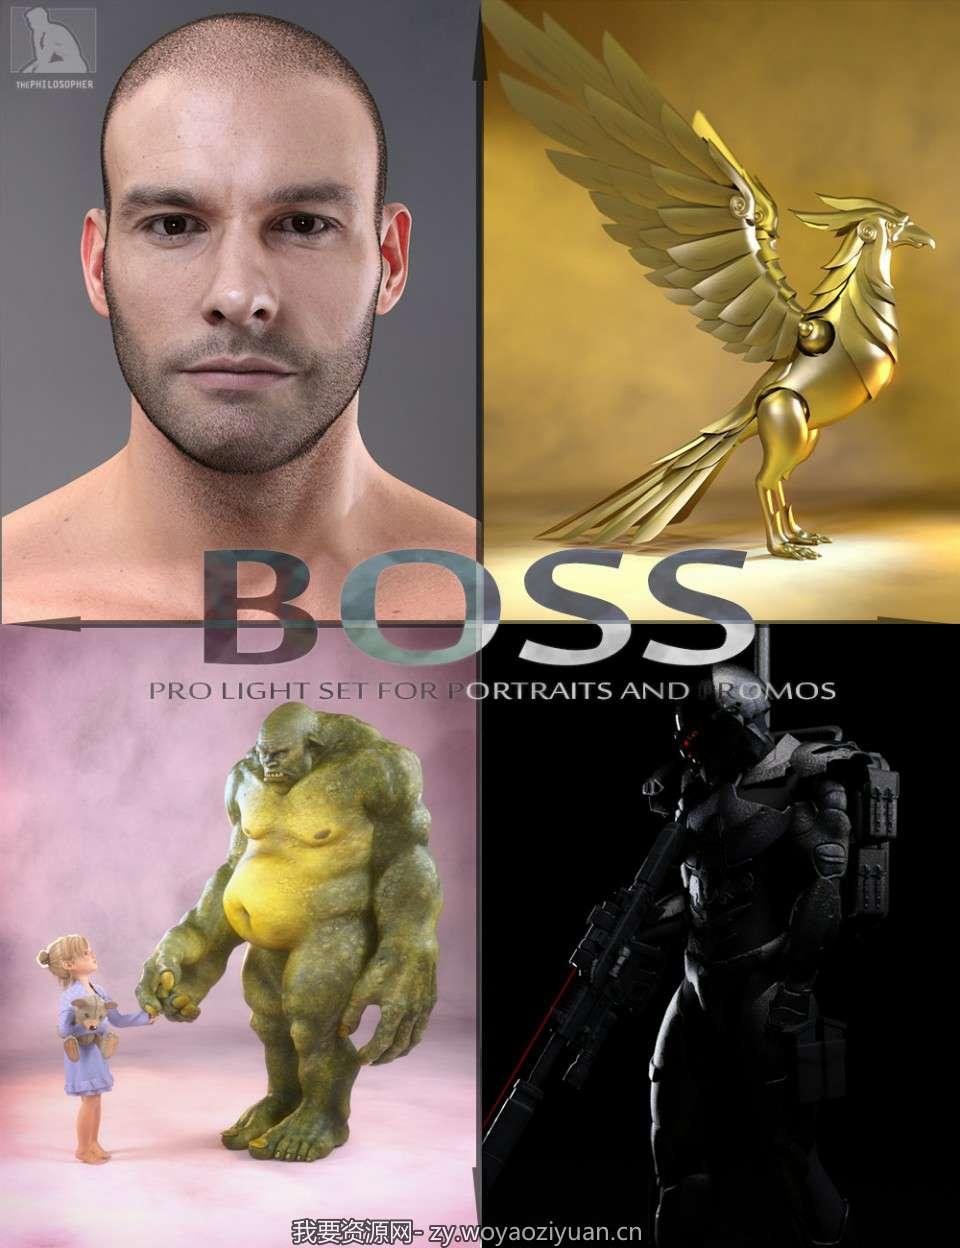 BOSS Pro Light Set for Portraits & Promos